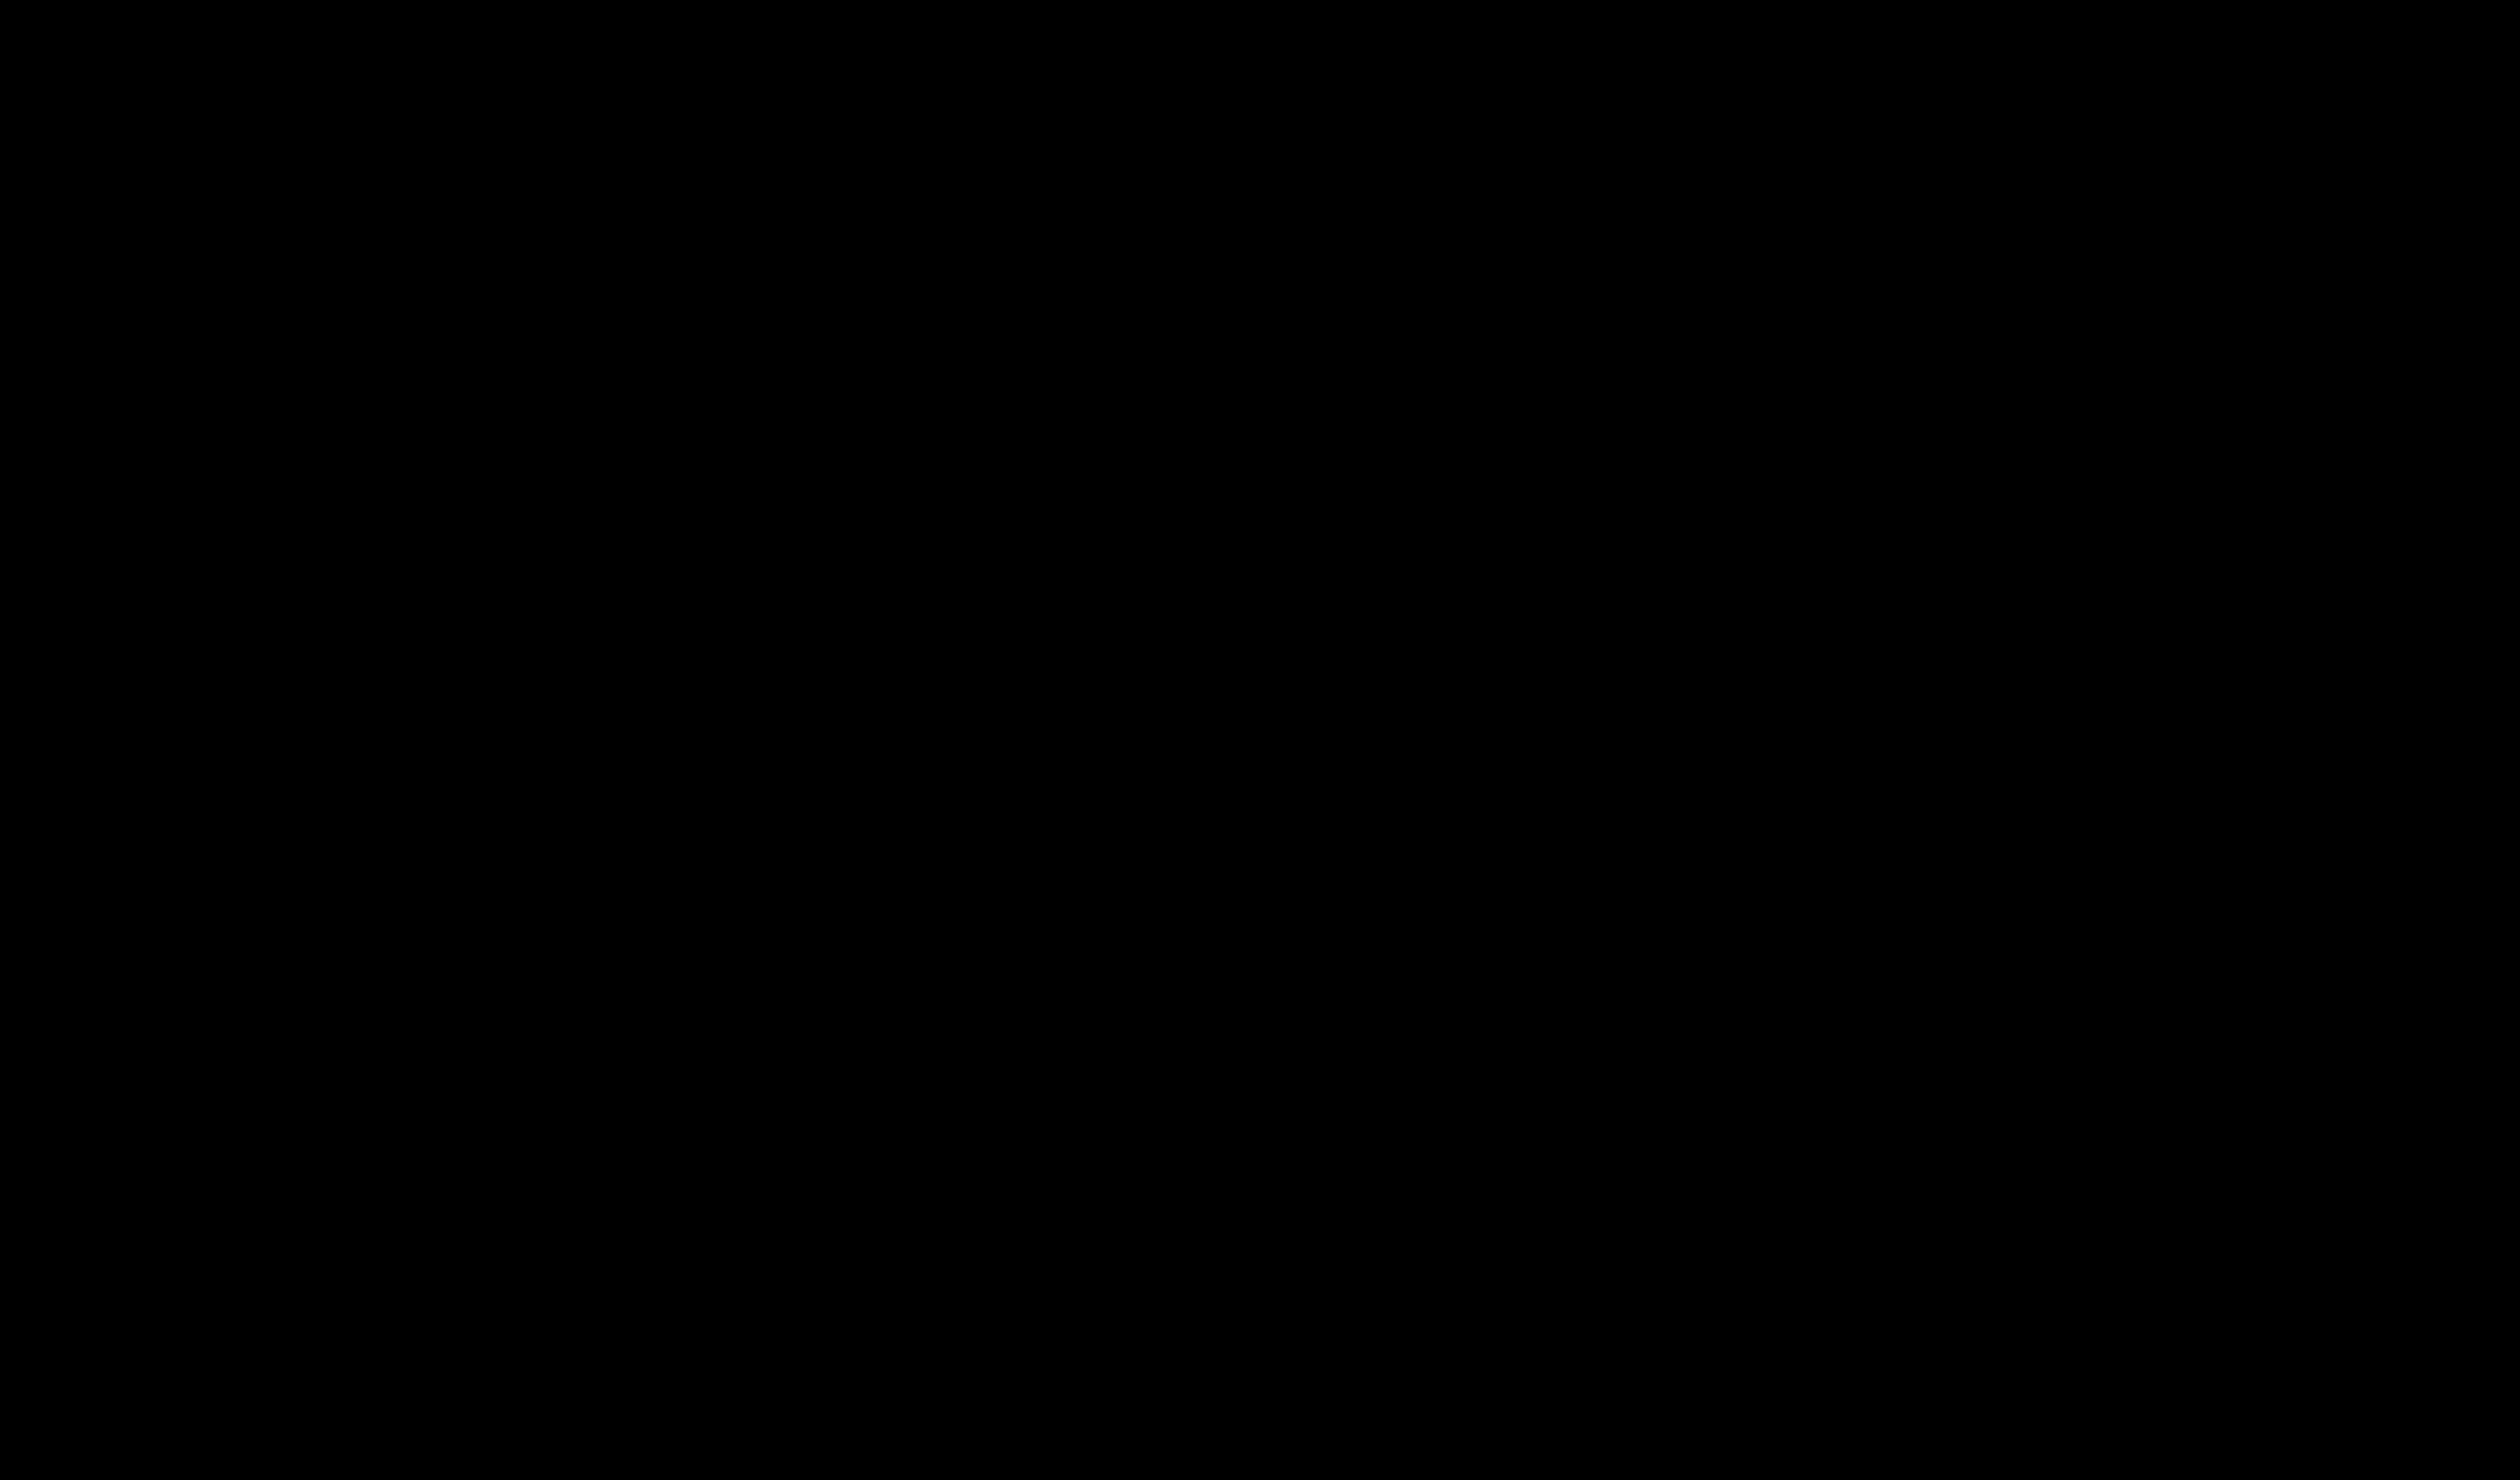 ABRS-landscape-black-fulltext